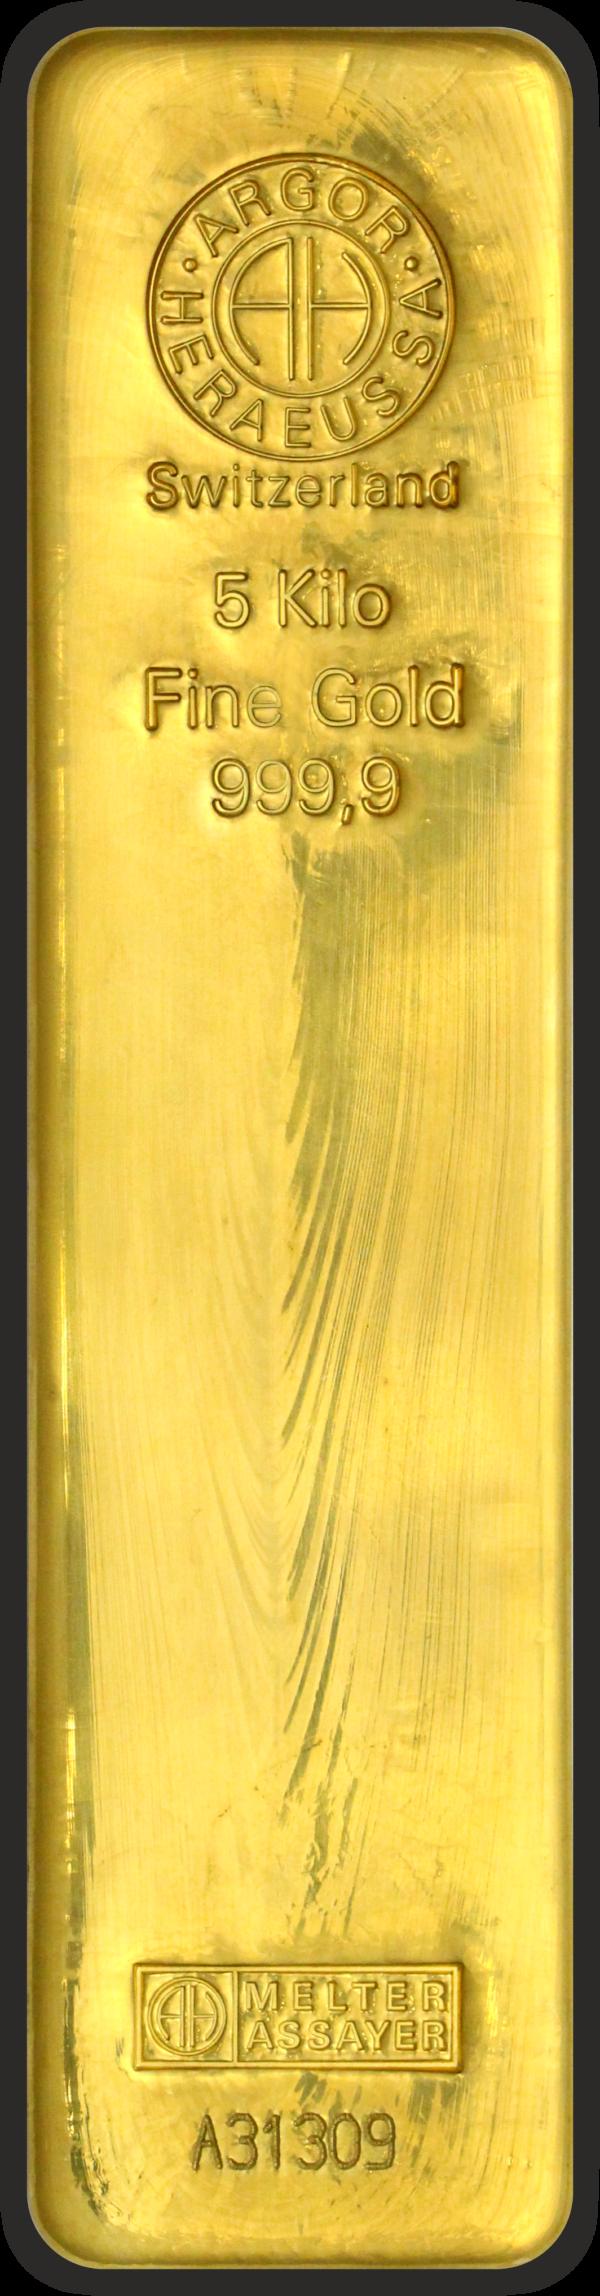 5 kg Guldbarre fra Argor Heraeus i Schweiz. Vitus Guld forhandler Guldbarre